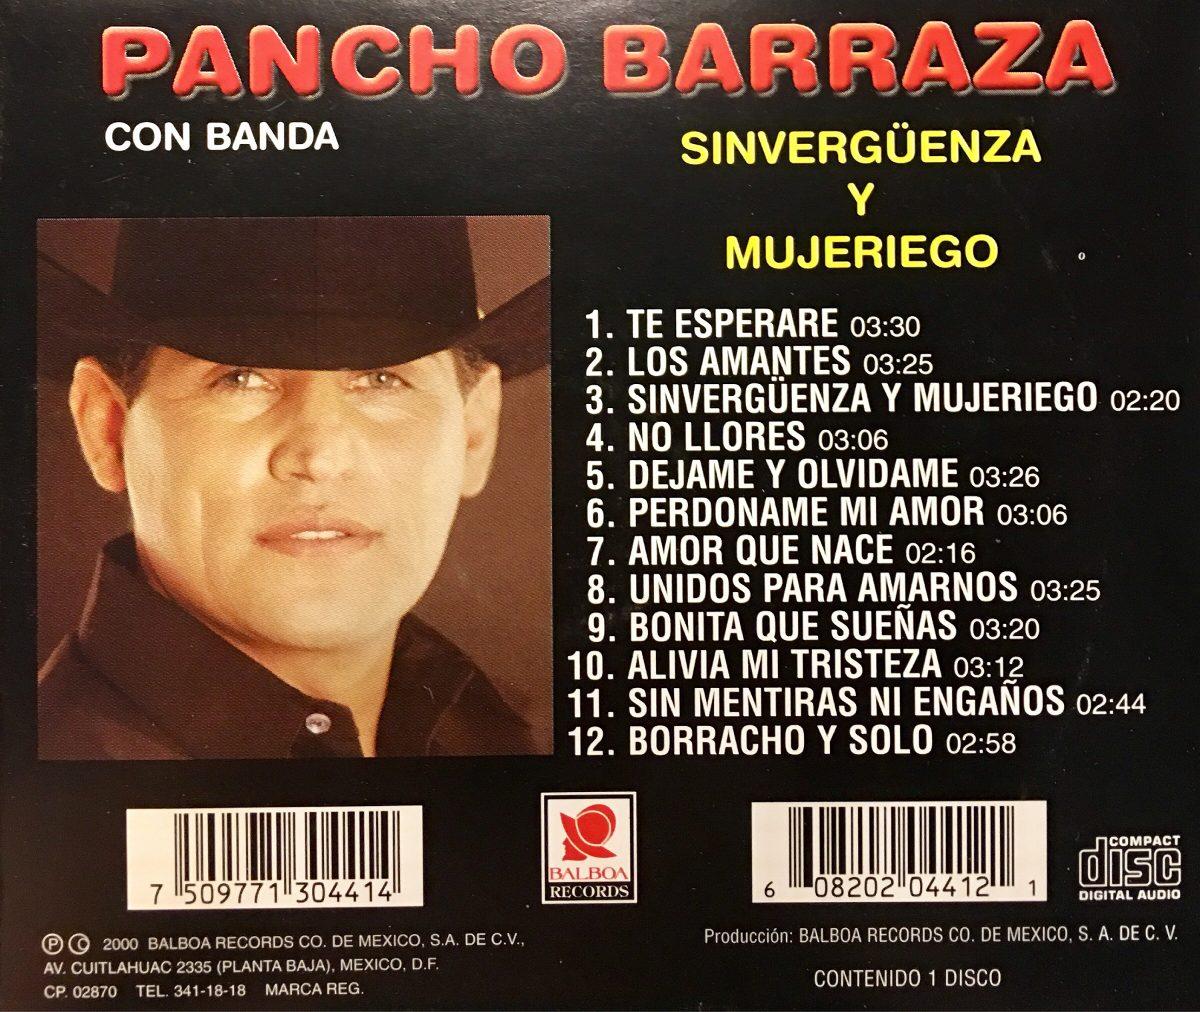 Cd Pancho Barraza Sinverguenza Y Mujeriego - $ 689.99 en Mercado Libre